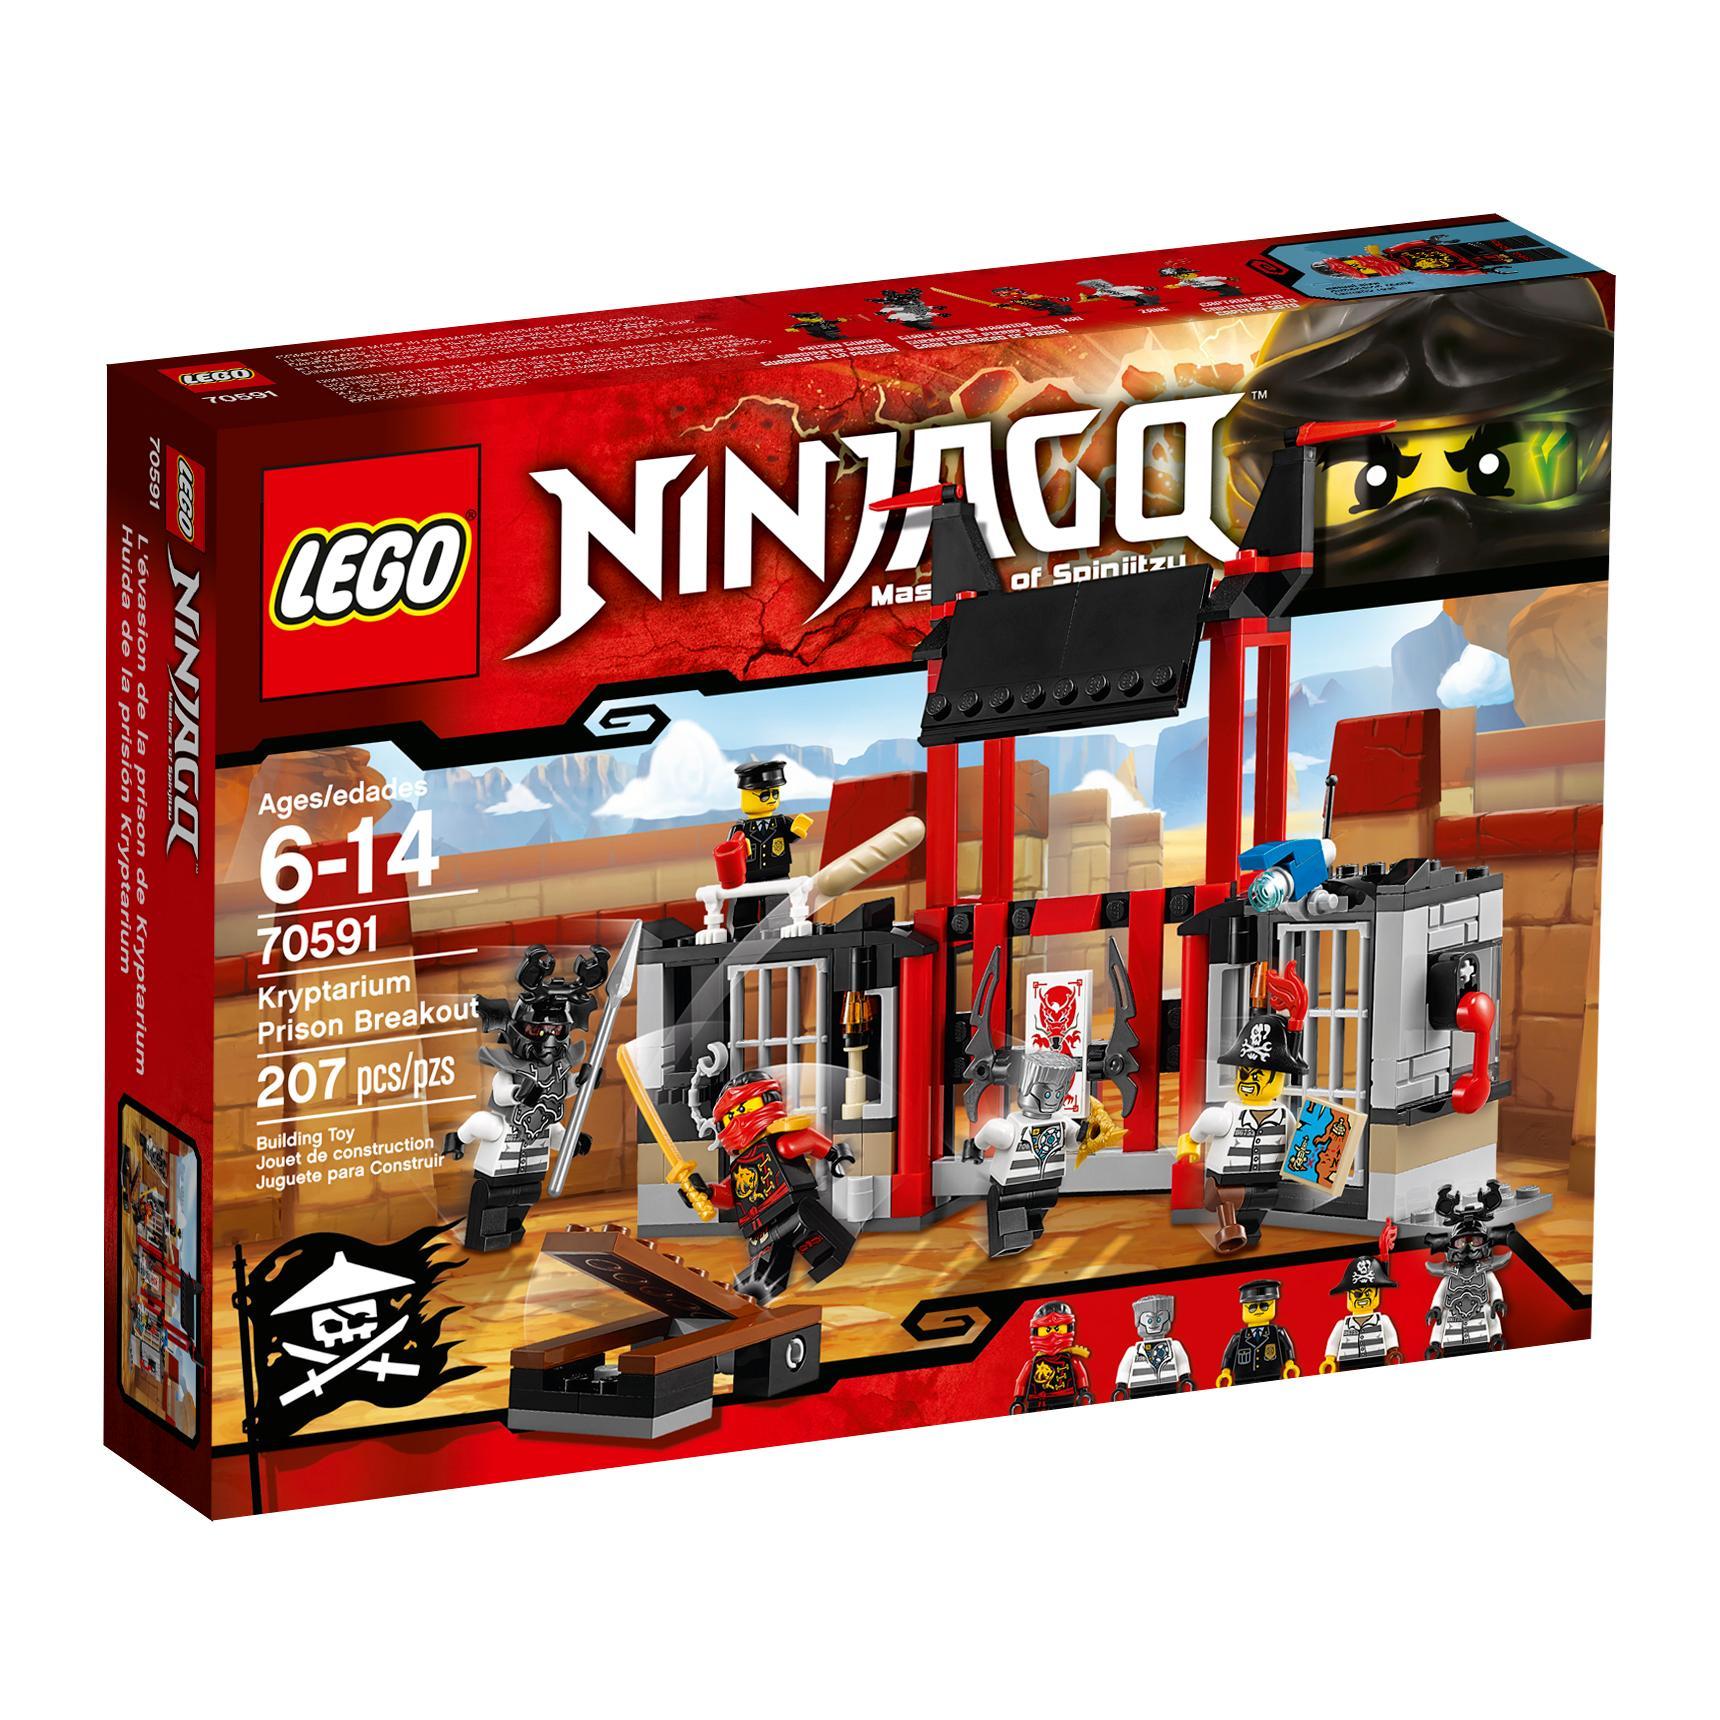 Amazoncom Lego Ninjago 70591 Kryptarium Prison Breakout Building